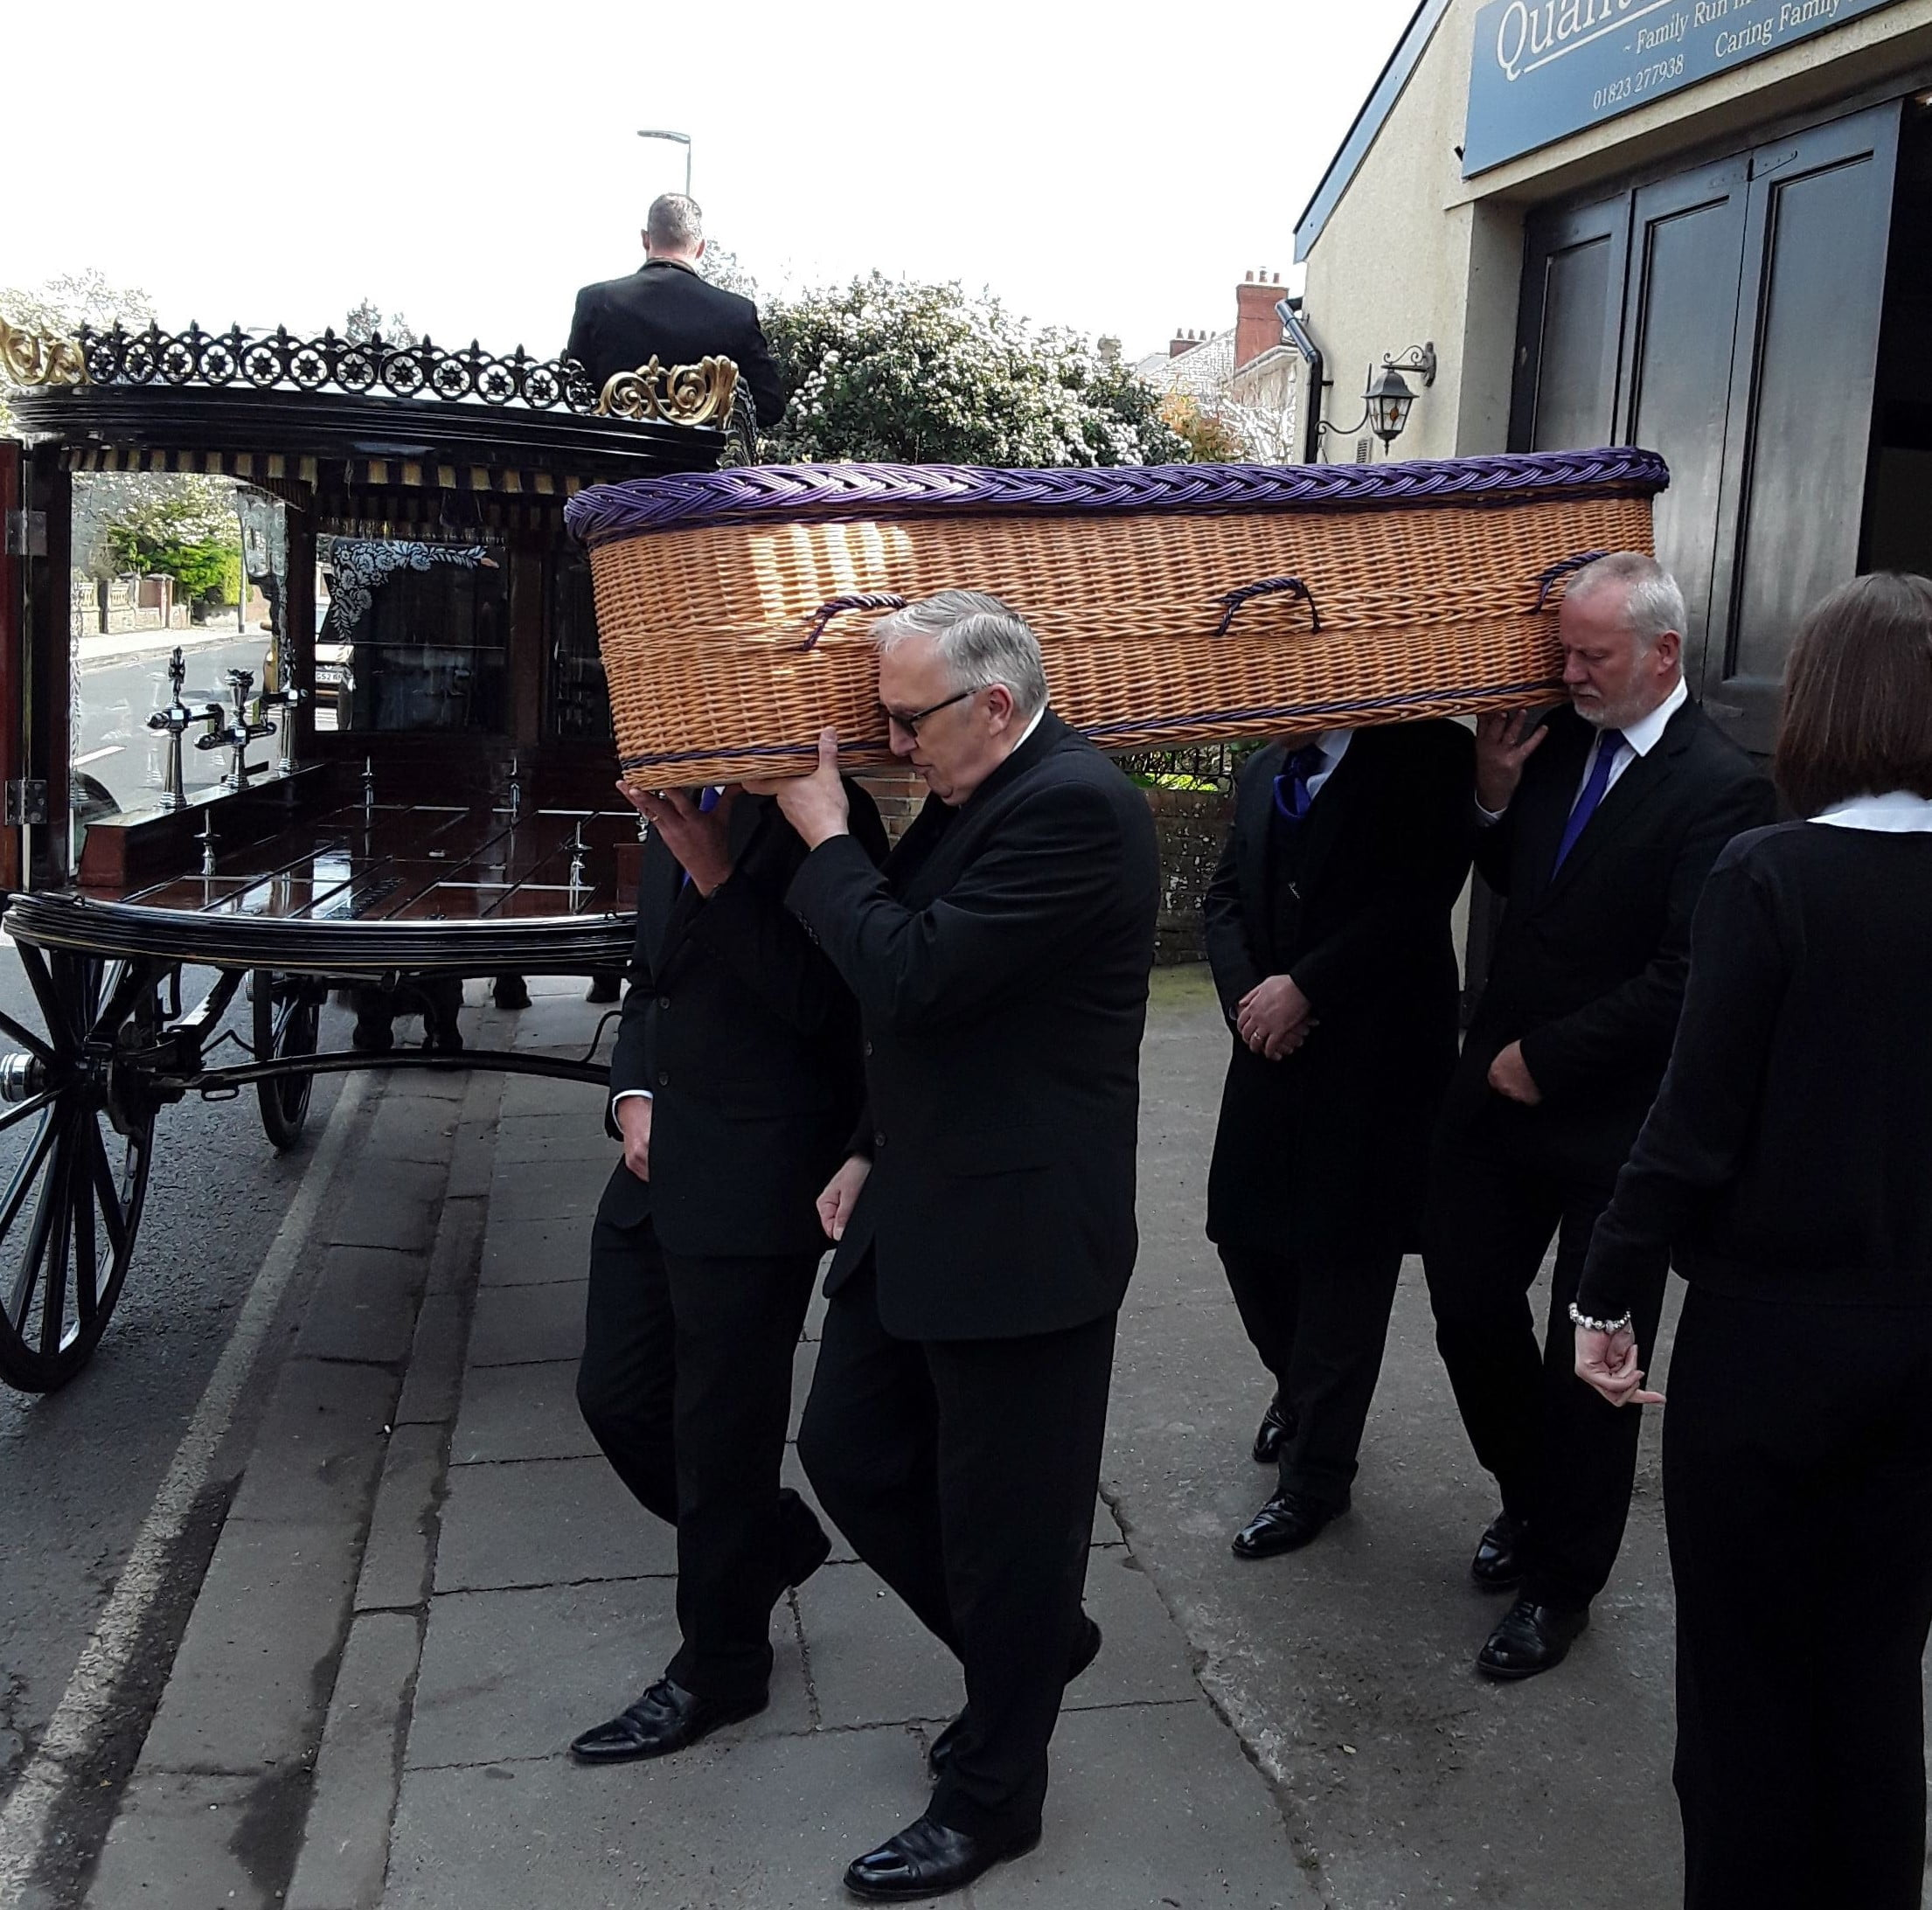 Coffin size